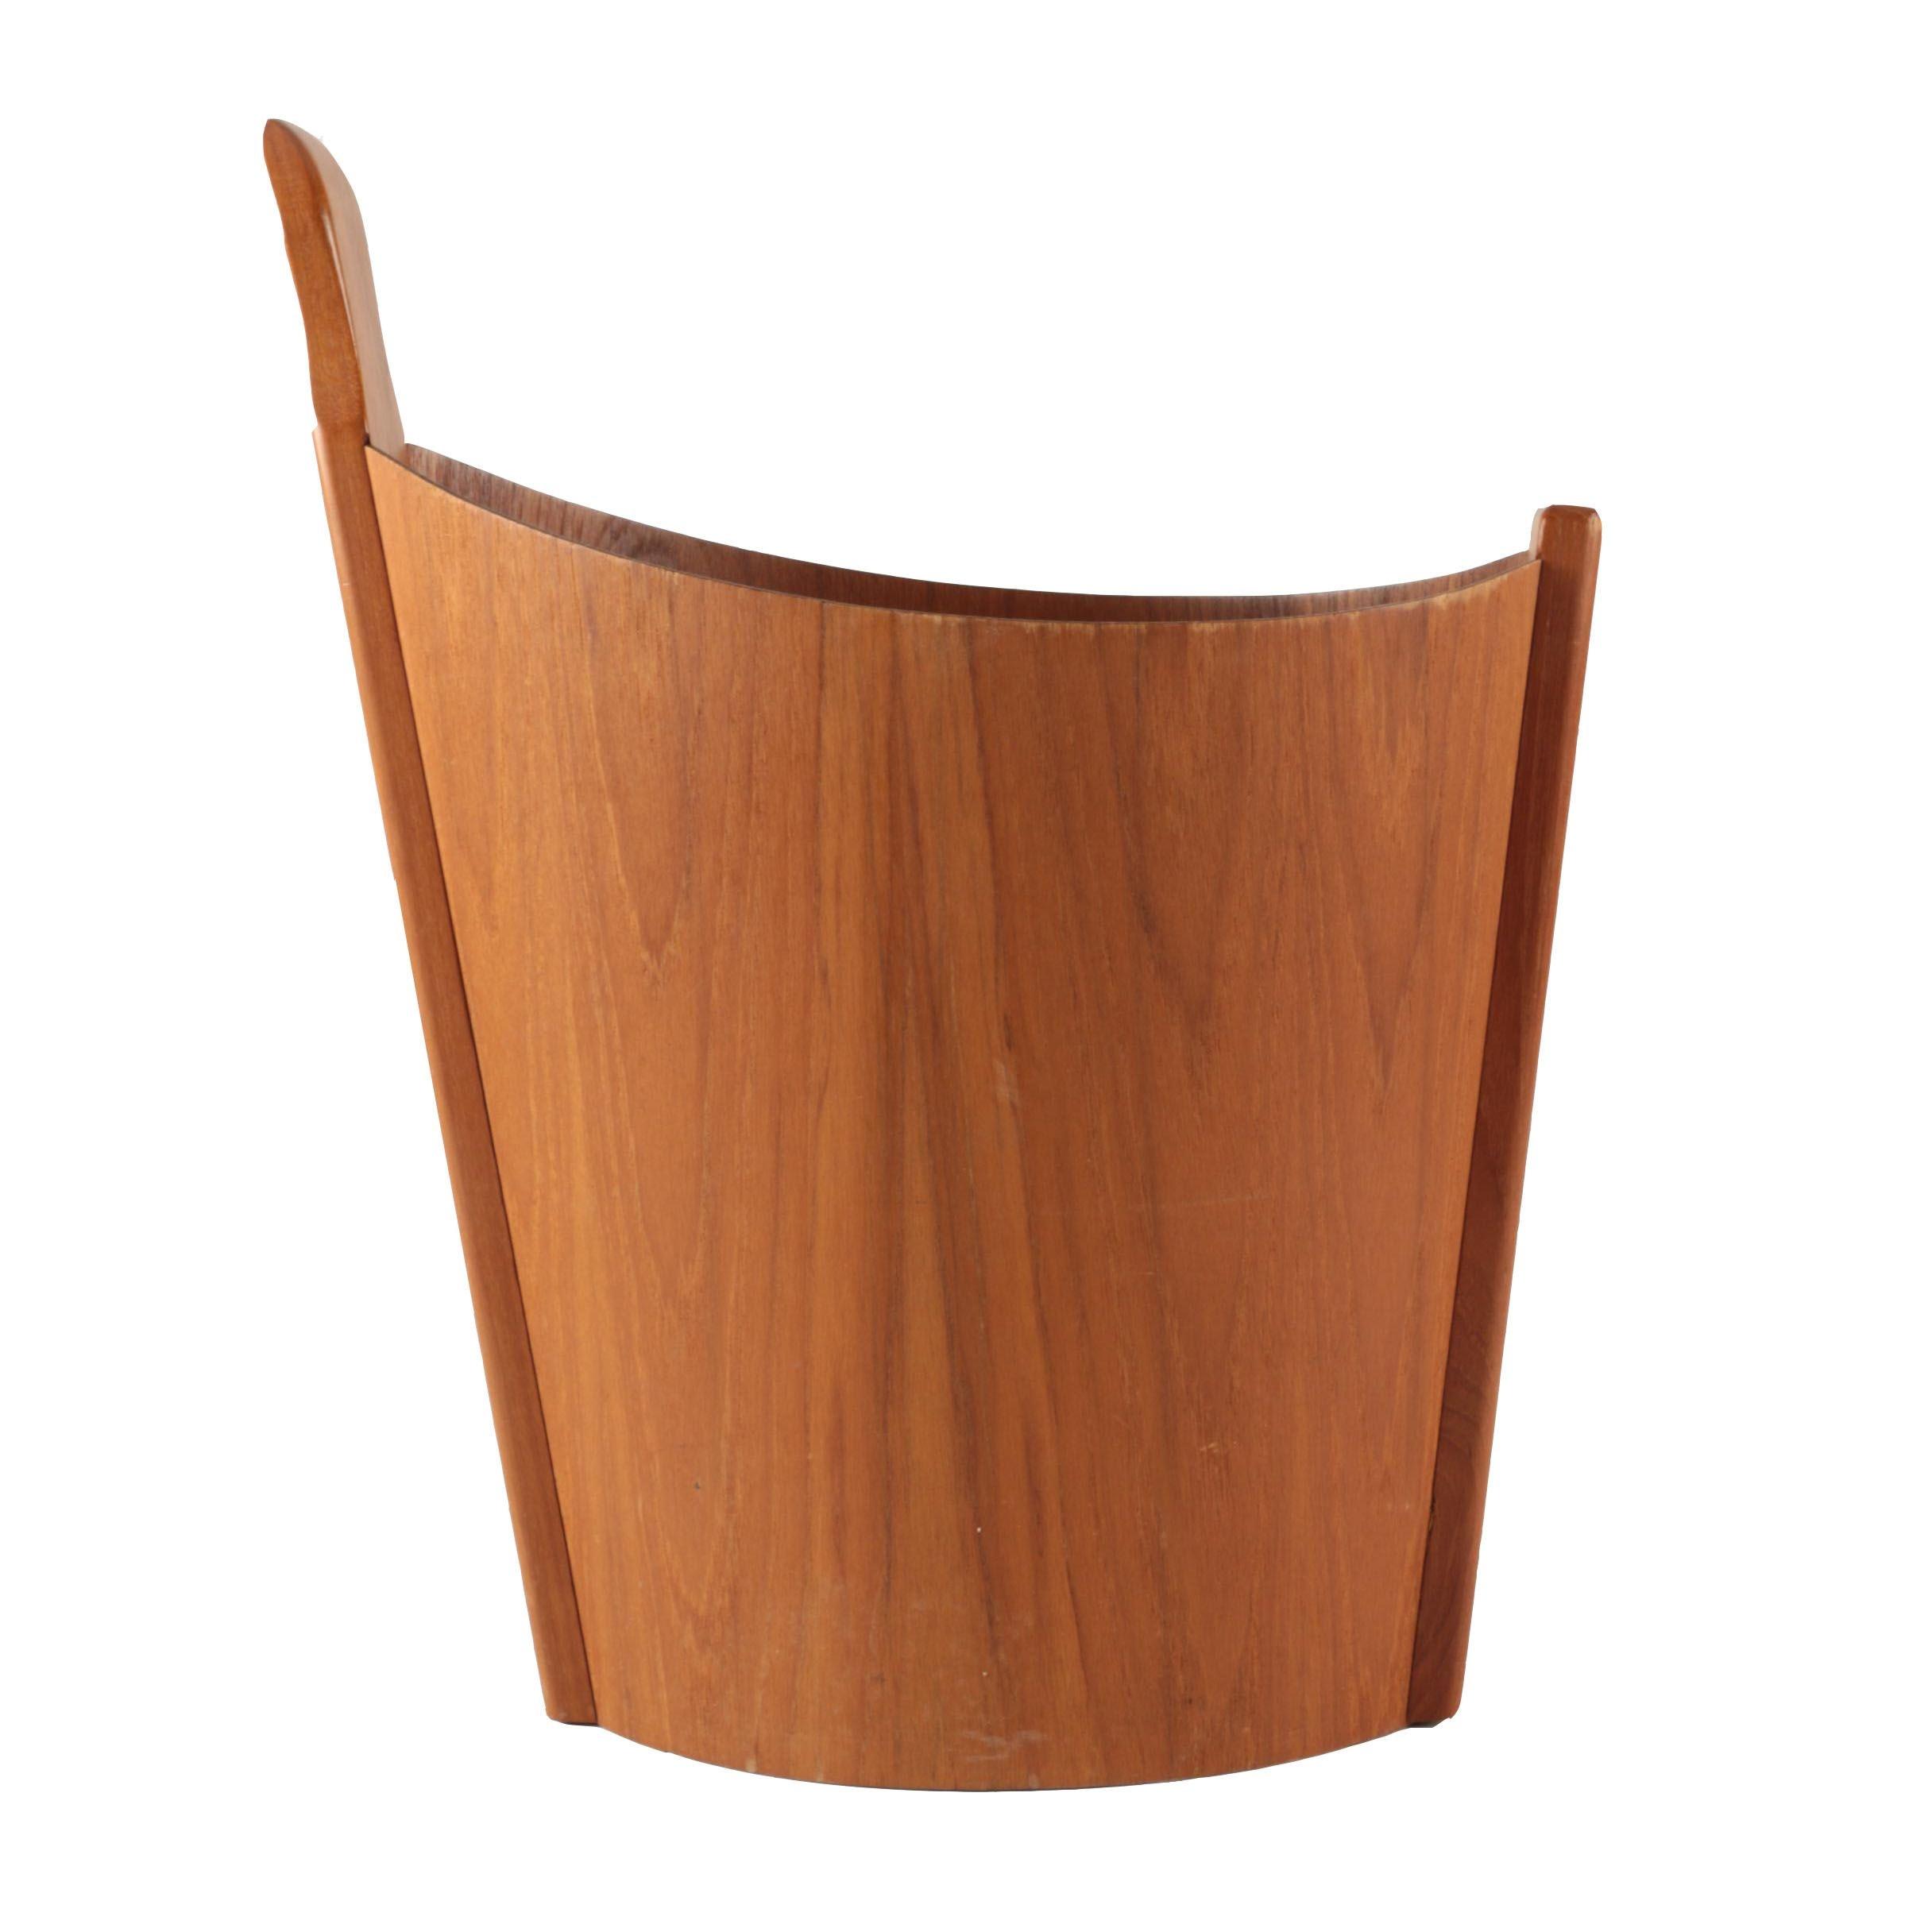 Danish Mid Century Wooden Waste Bin